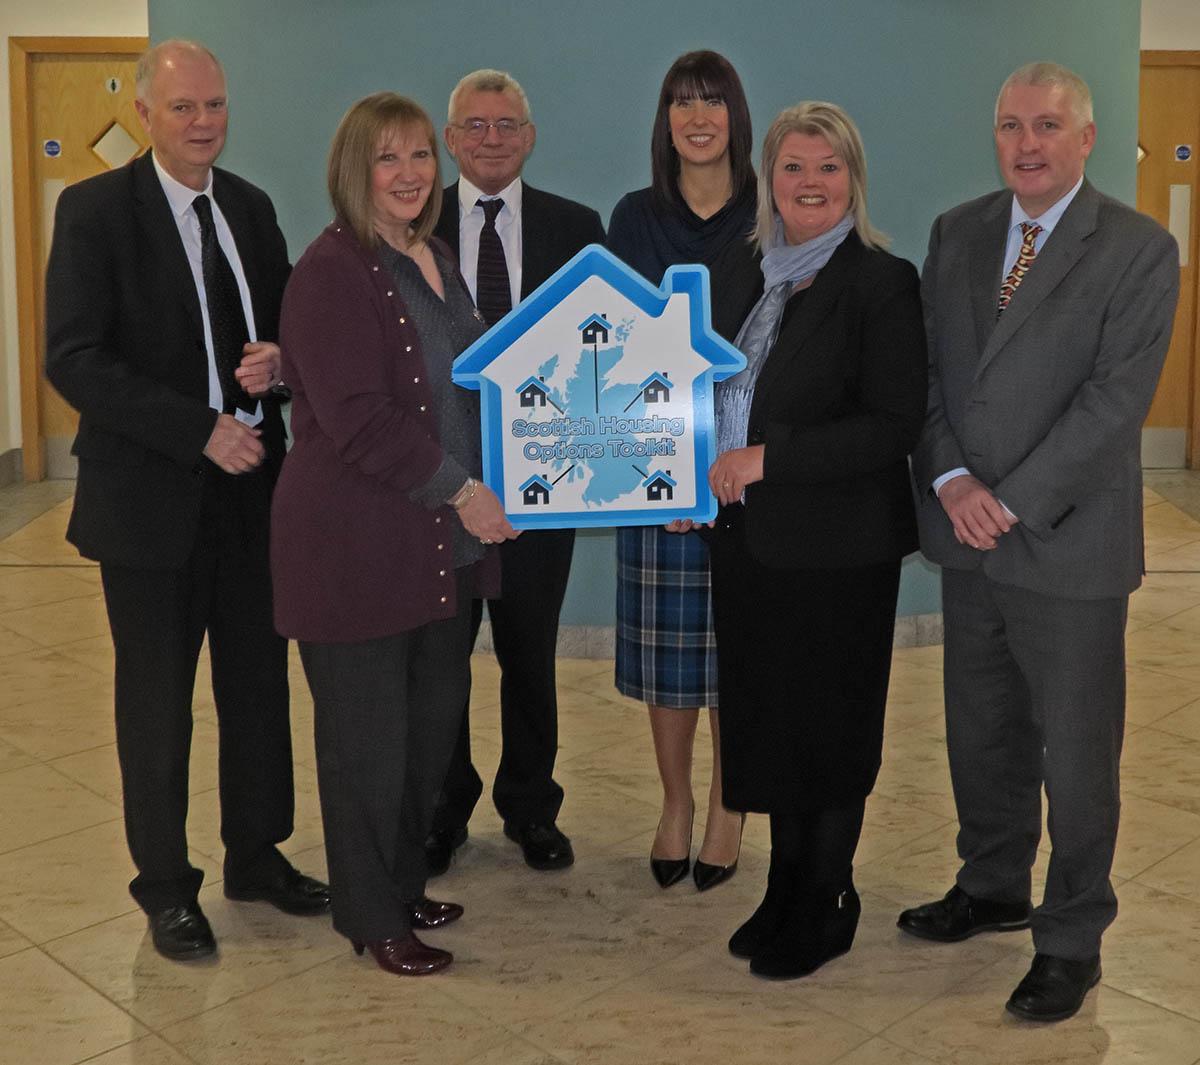 HousingITguy,Project365,2nd 365,HotpixUK365,Tone Smith,GoTonySmith,365,2365 one a day,Tony Smith,Hotpix,Motherwell,NLC,Housing Options,Scottish,Scotland,Council,eLearning Toolkit